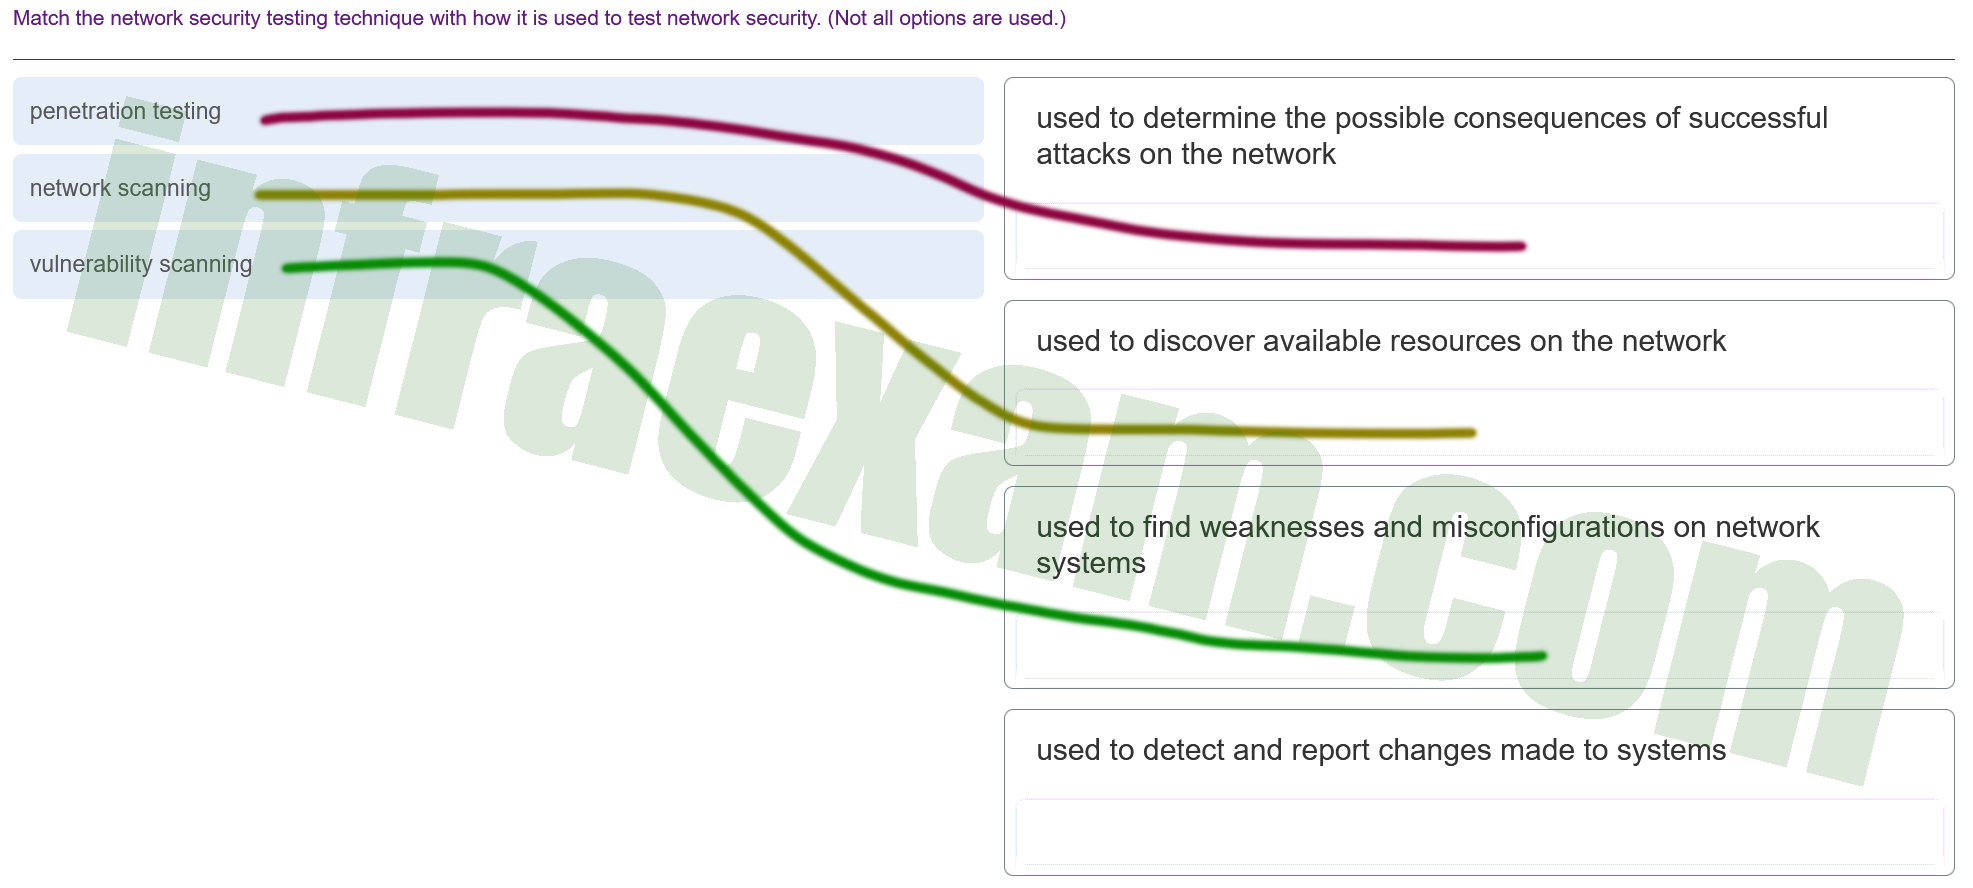 CyberOps Associate (Version 1.0) - CyberOps Associate 1.0 Practice Final Exam Answers 004